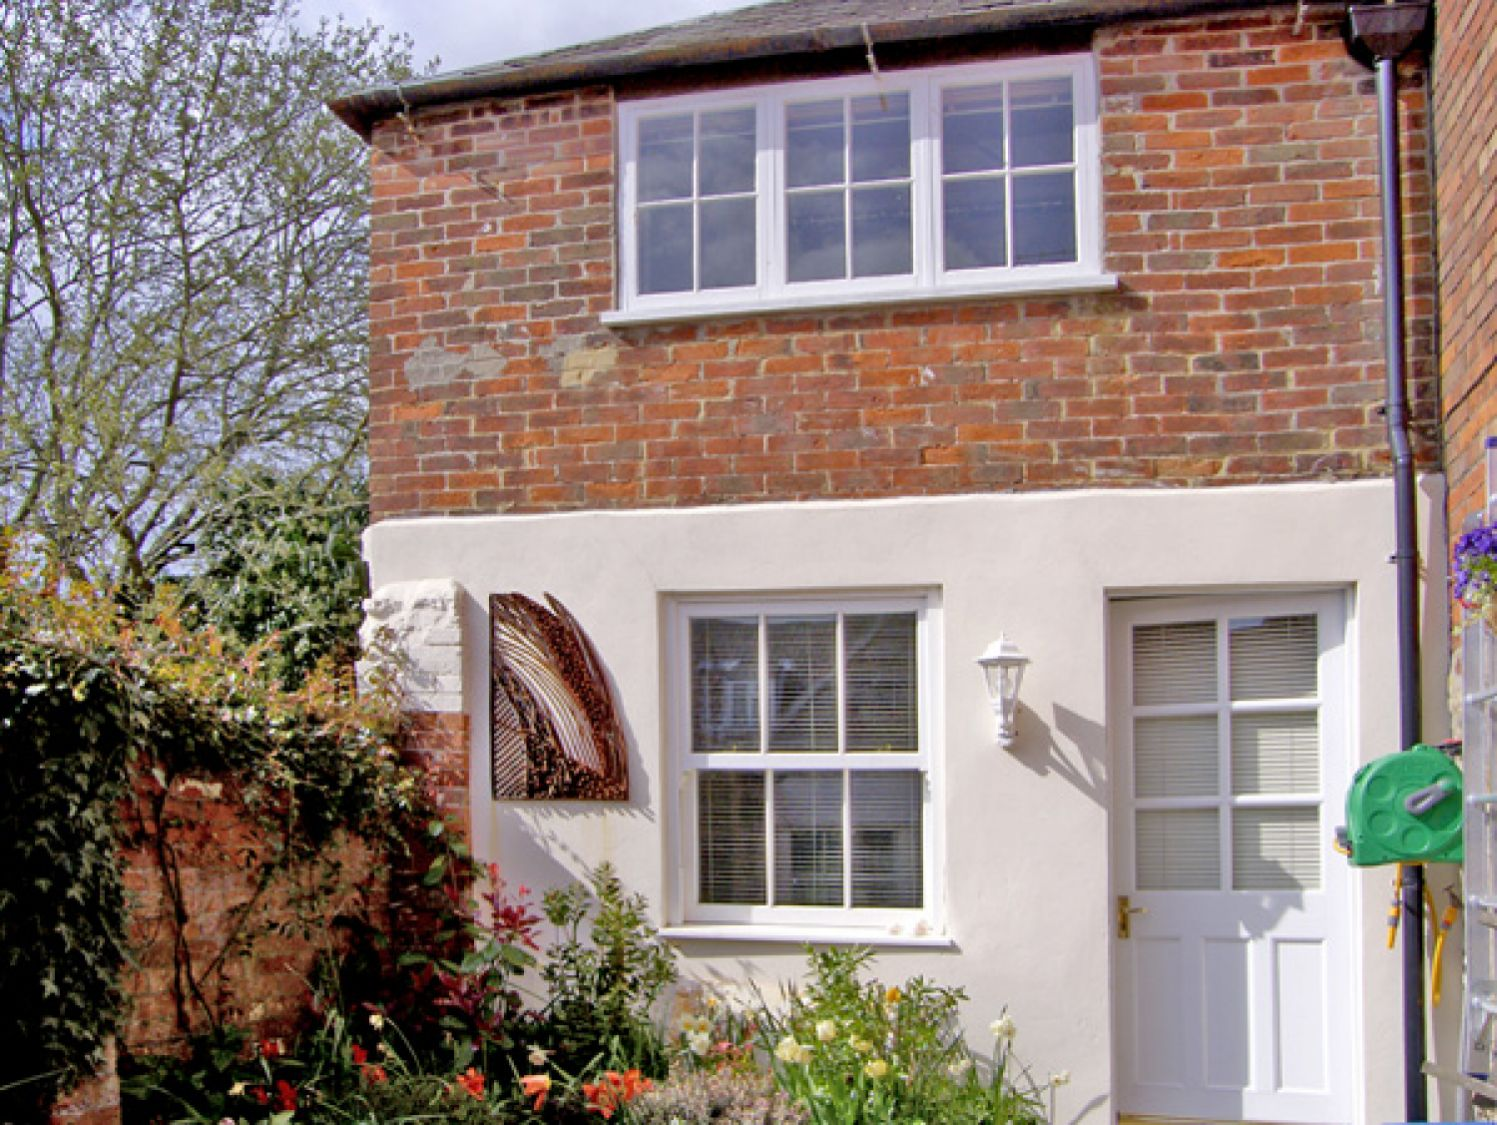 Glover's Cottage - Dorset - 2437 - photo 1